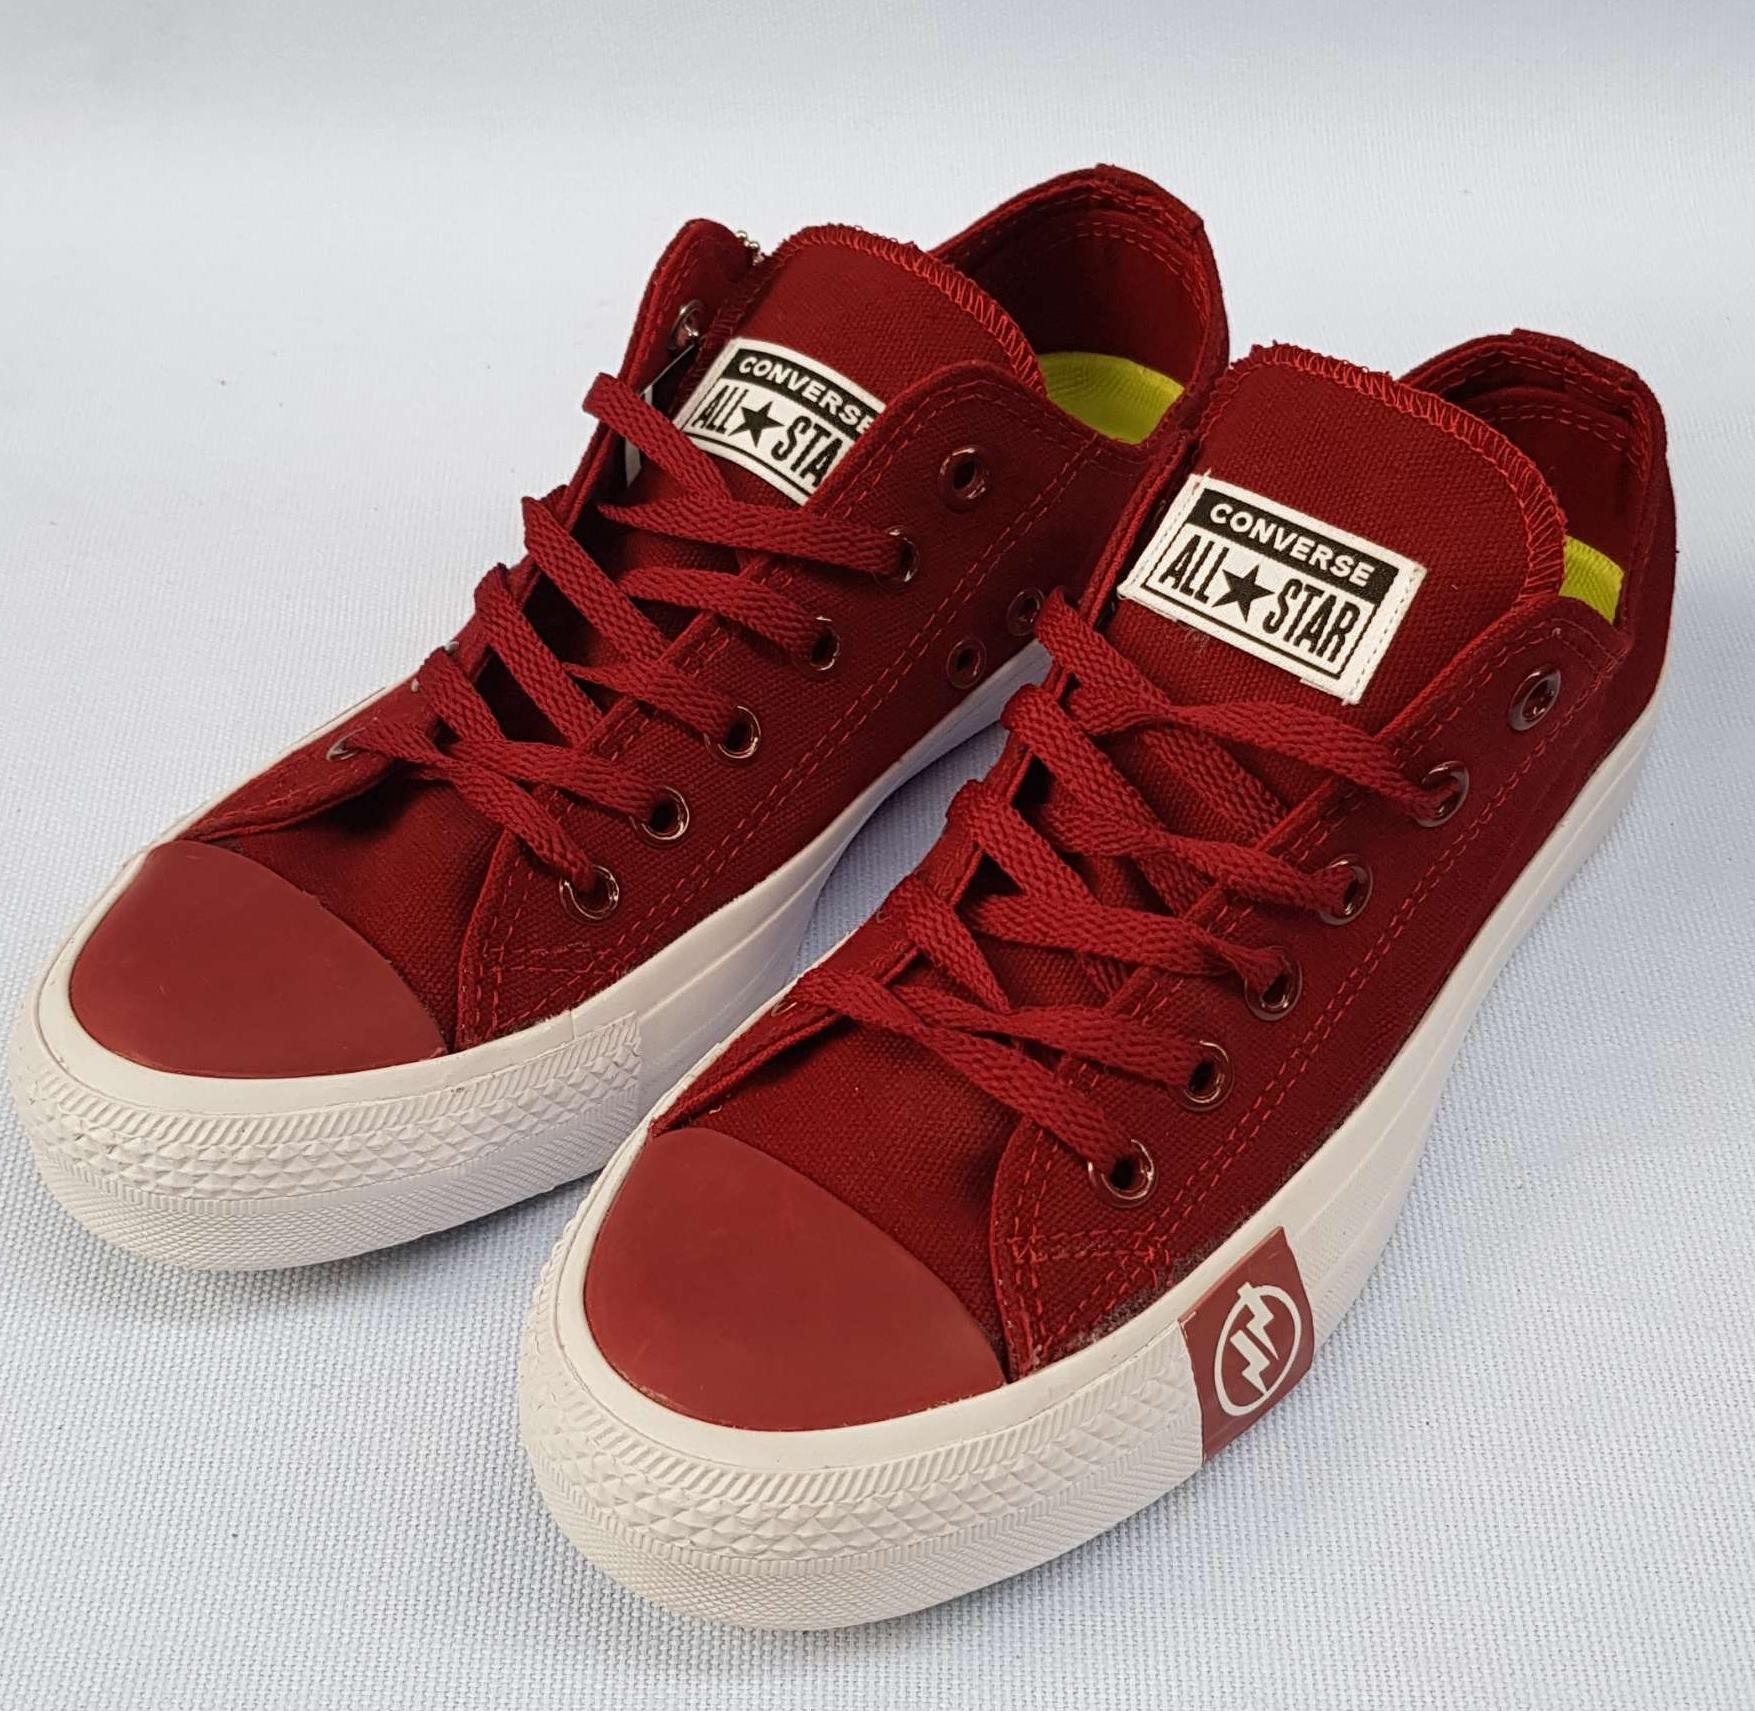 Kelebihan Sepatu Converse Chuck Tailor 2 Flash Terkini - Daftar ... eb7a60d89c